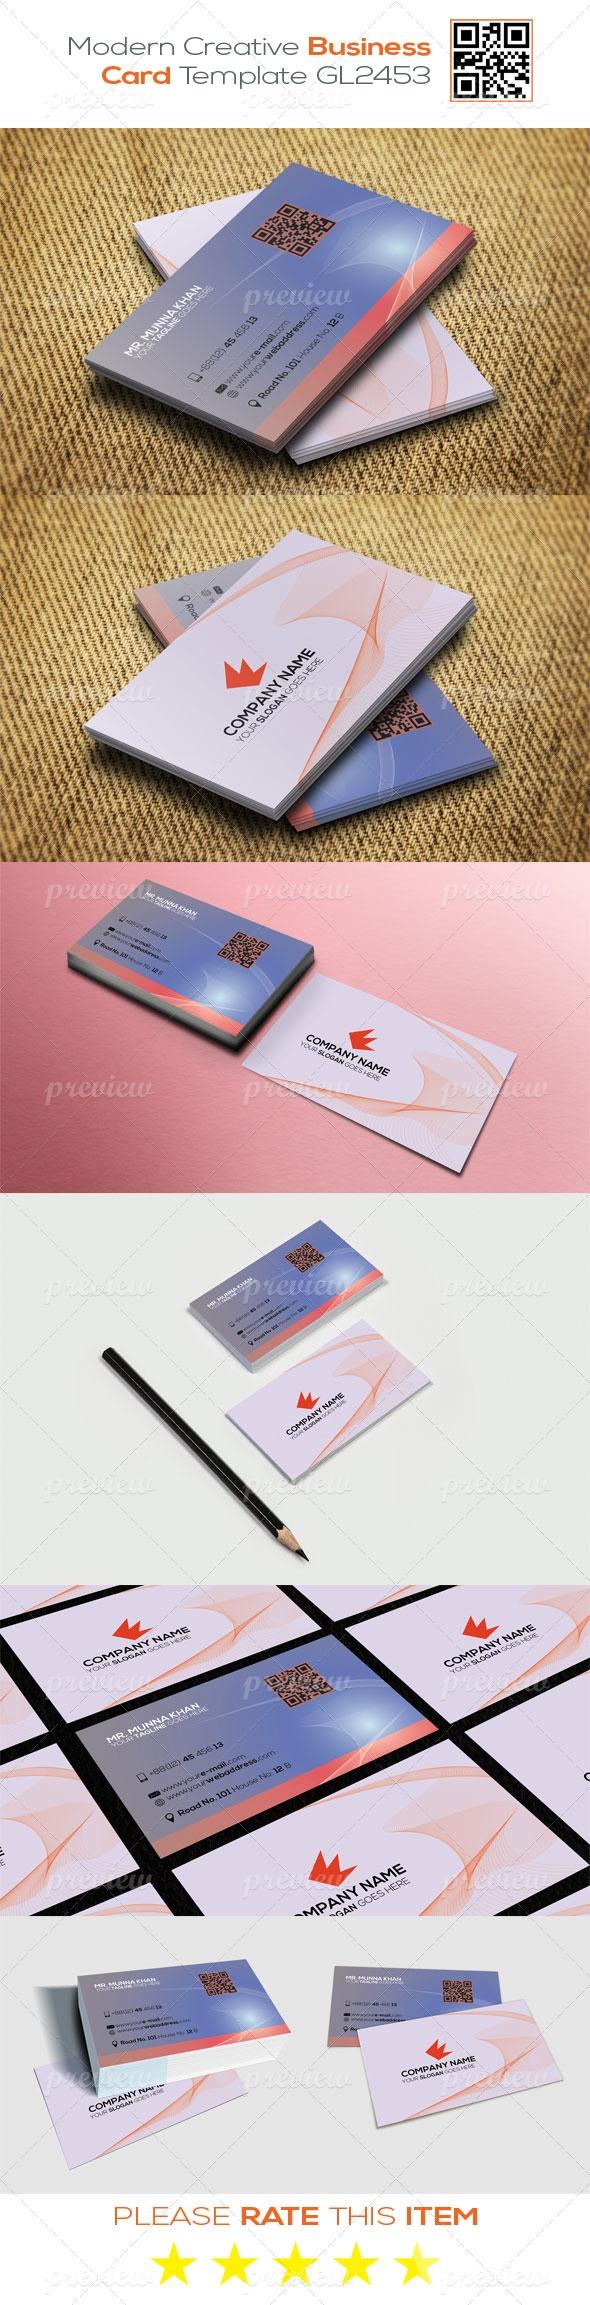 Modern Creative Business Card Template GL2453